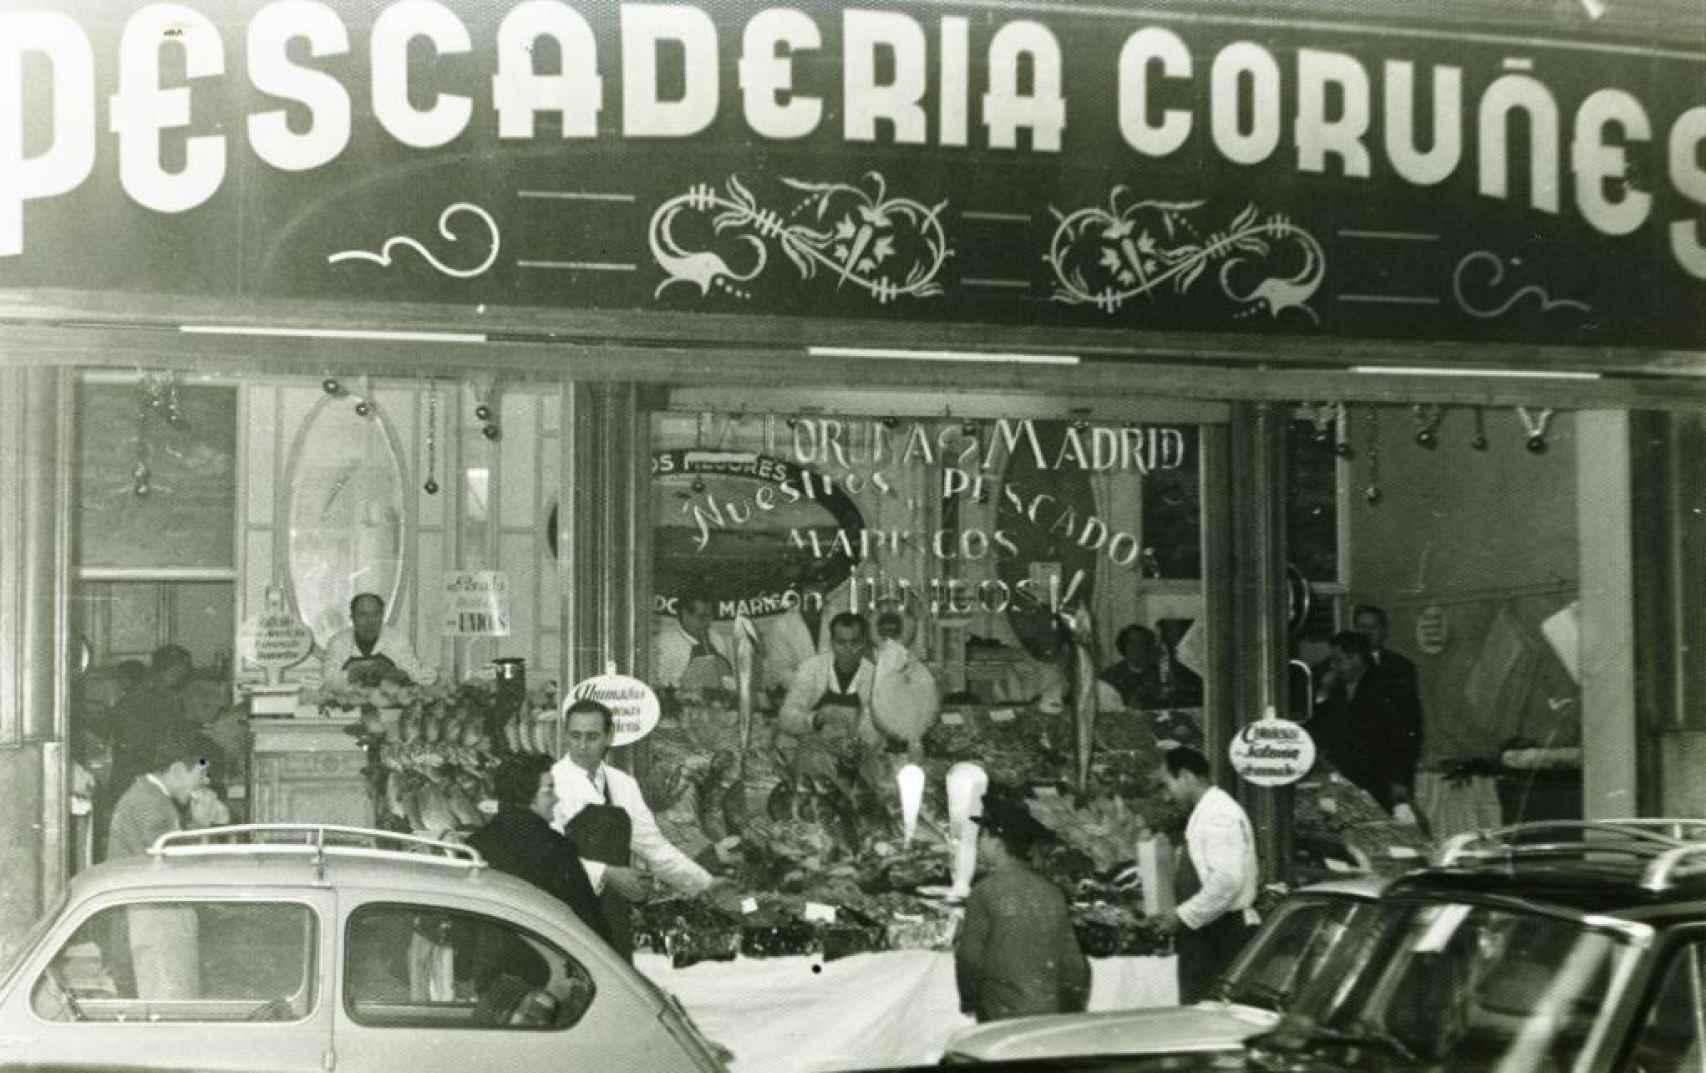 Tienda Calle Recoletos de Pescaderías Coruñesas.